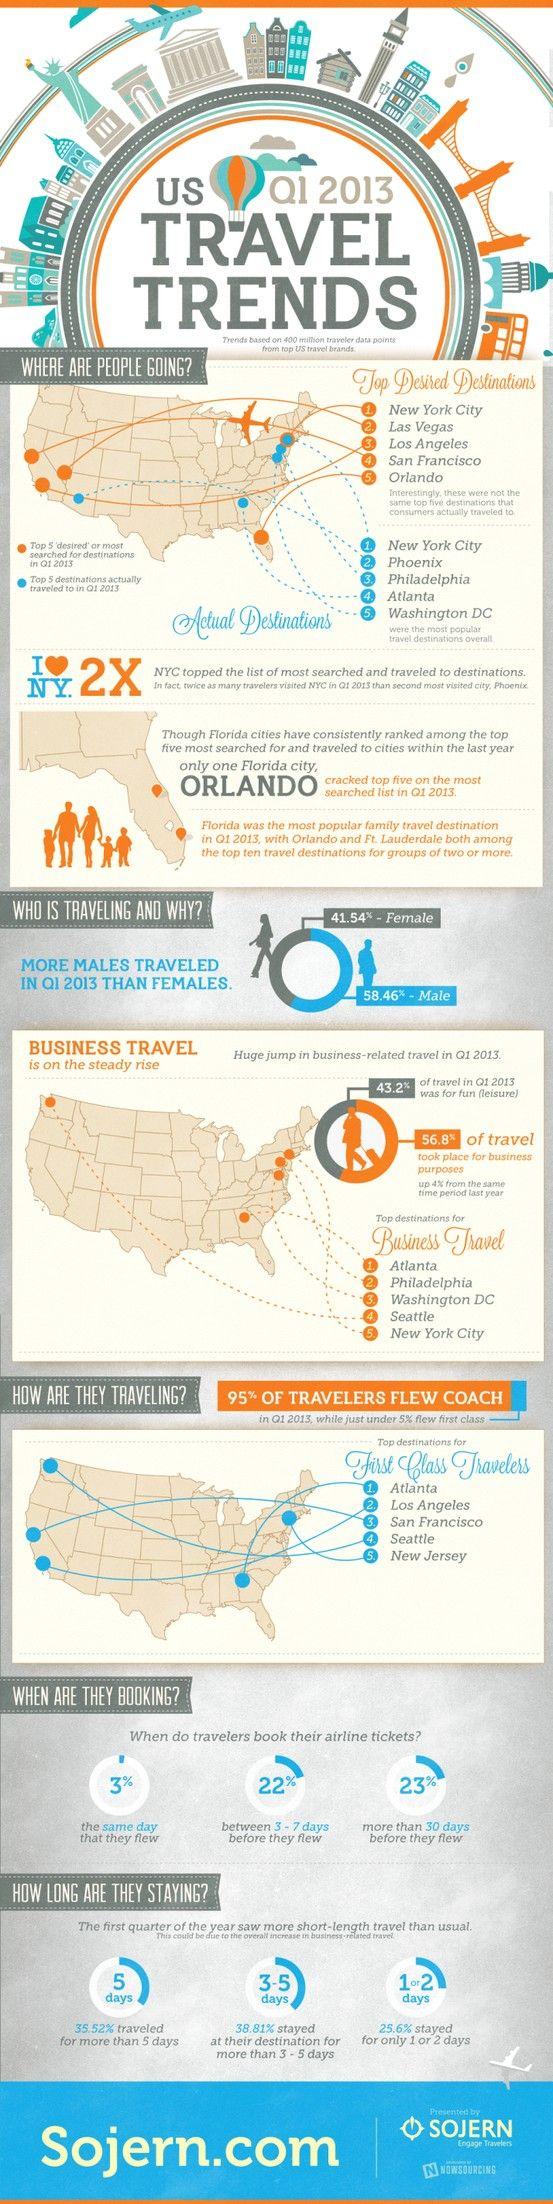 US Travel trends #infografia #infographic #tourism